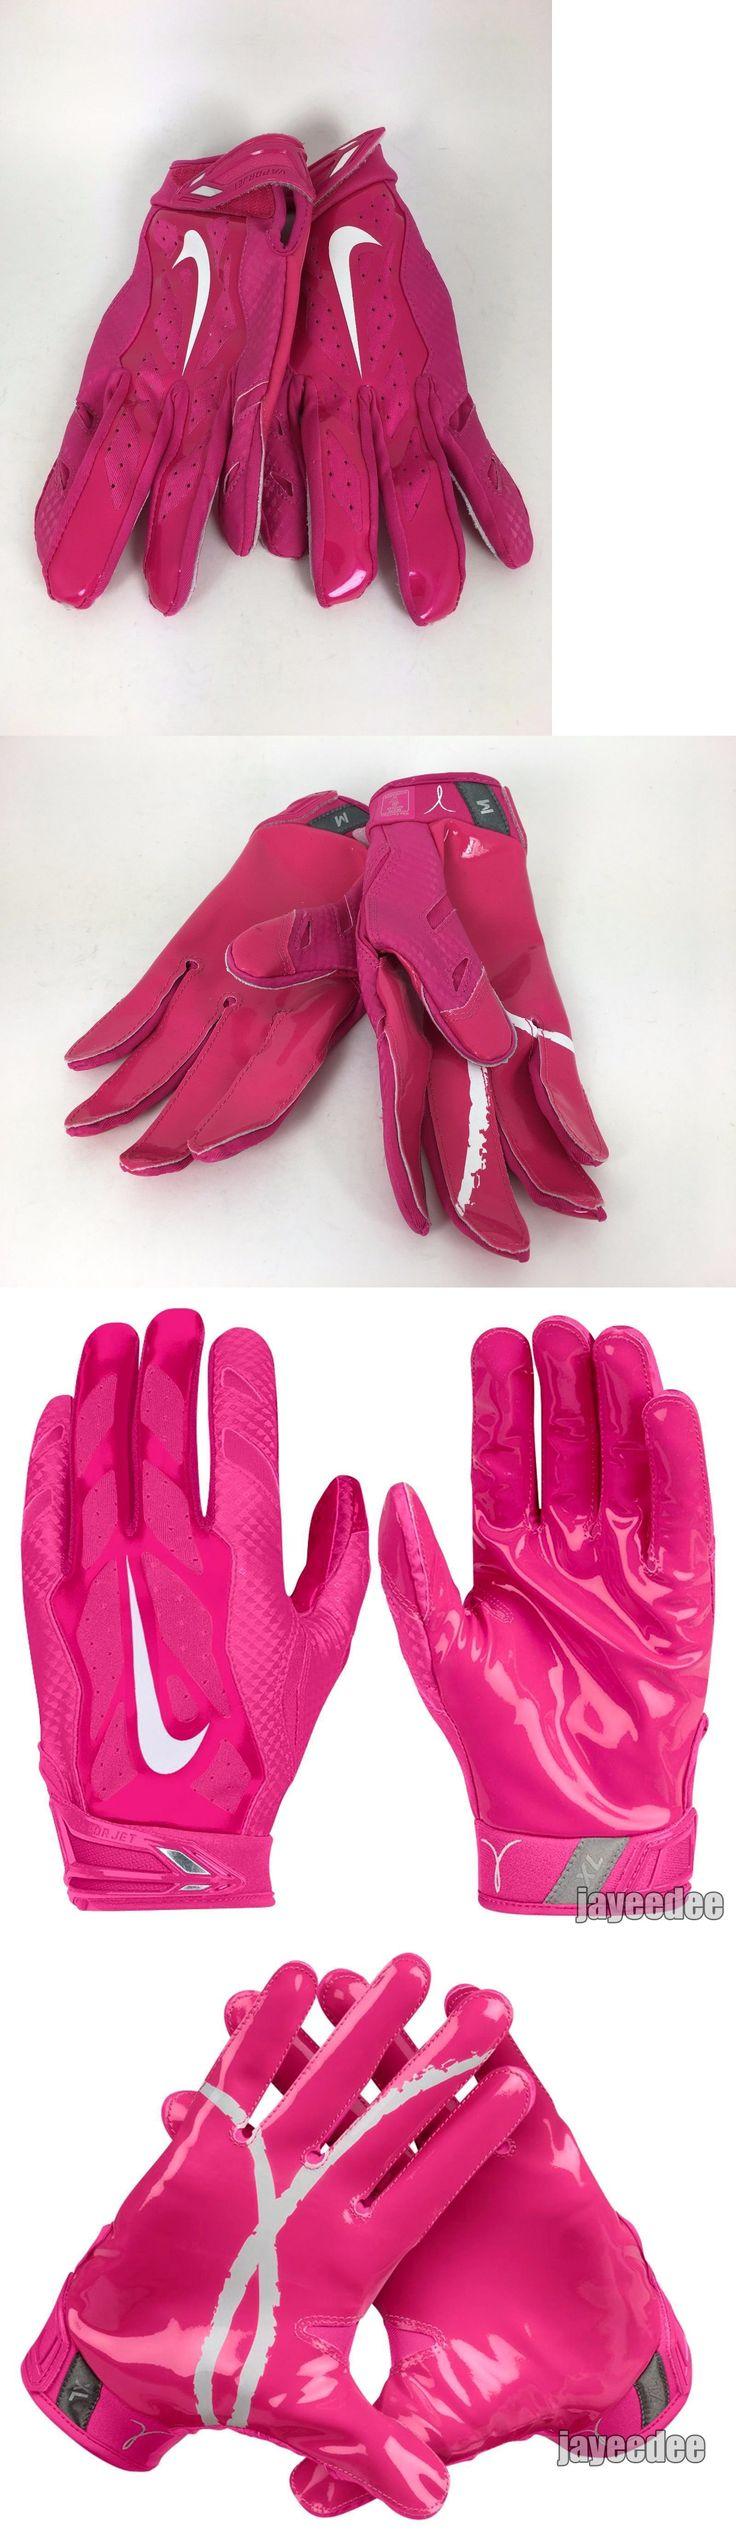 Gloves 159114: Nike Adult Vapor Jet 3.0 Football Gloves Pink Bca Sz Medium M (Gf0497-652) -> BUY IT NOW ONLY: $37.97 on eBay!